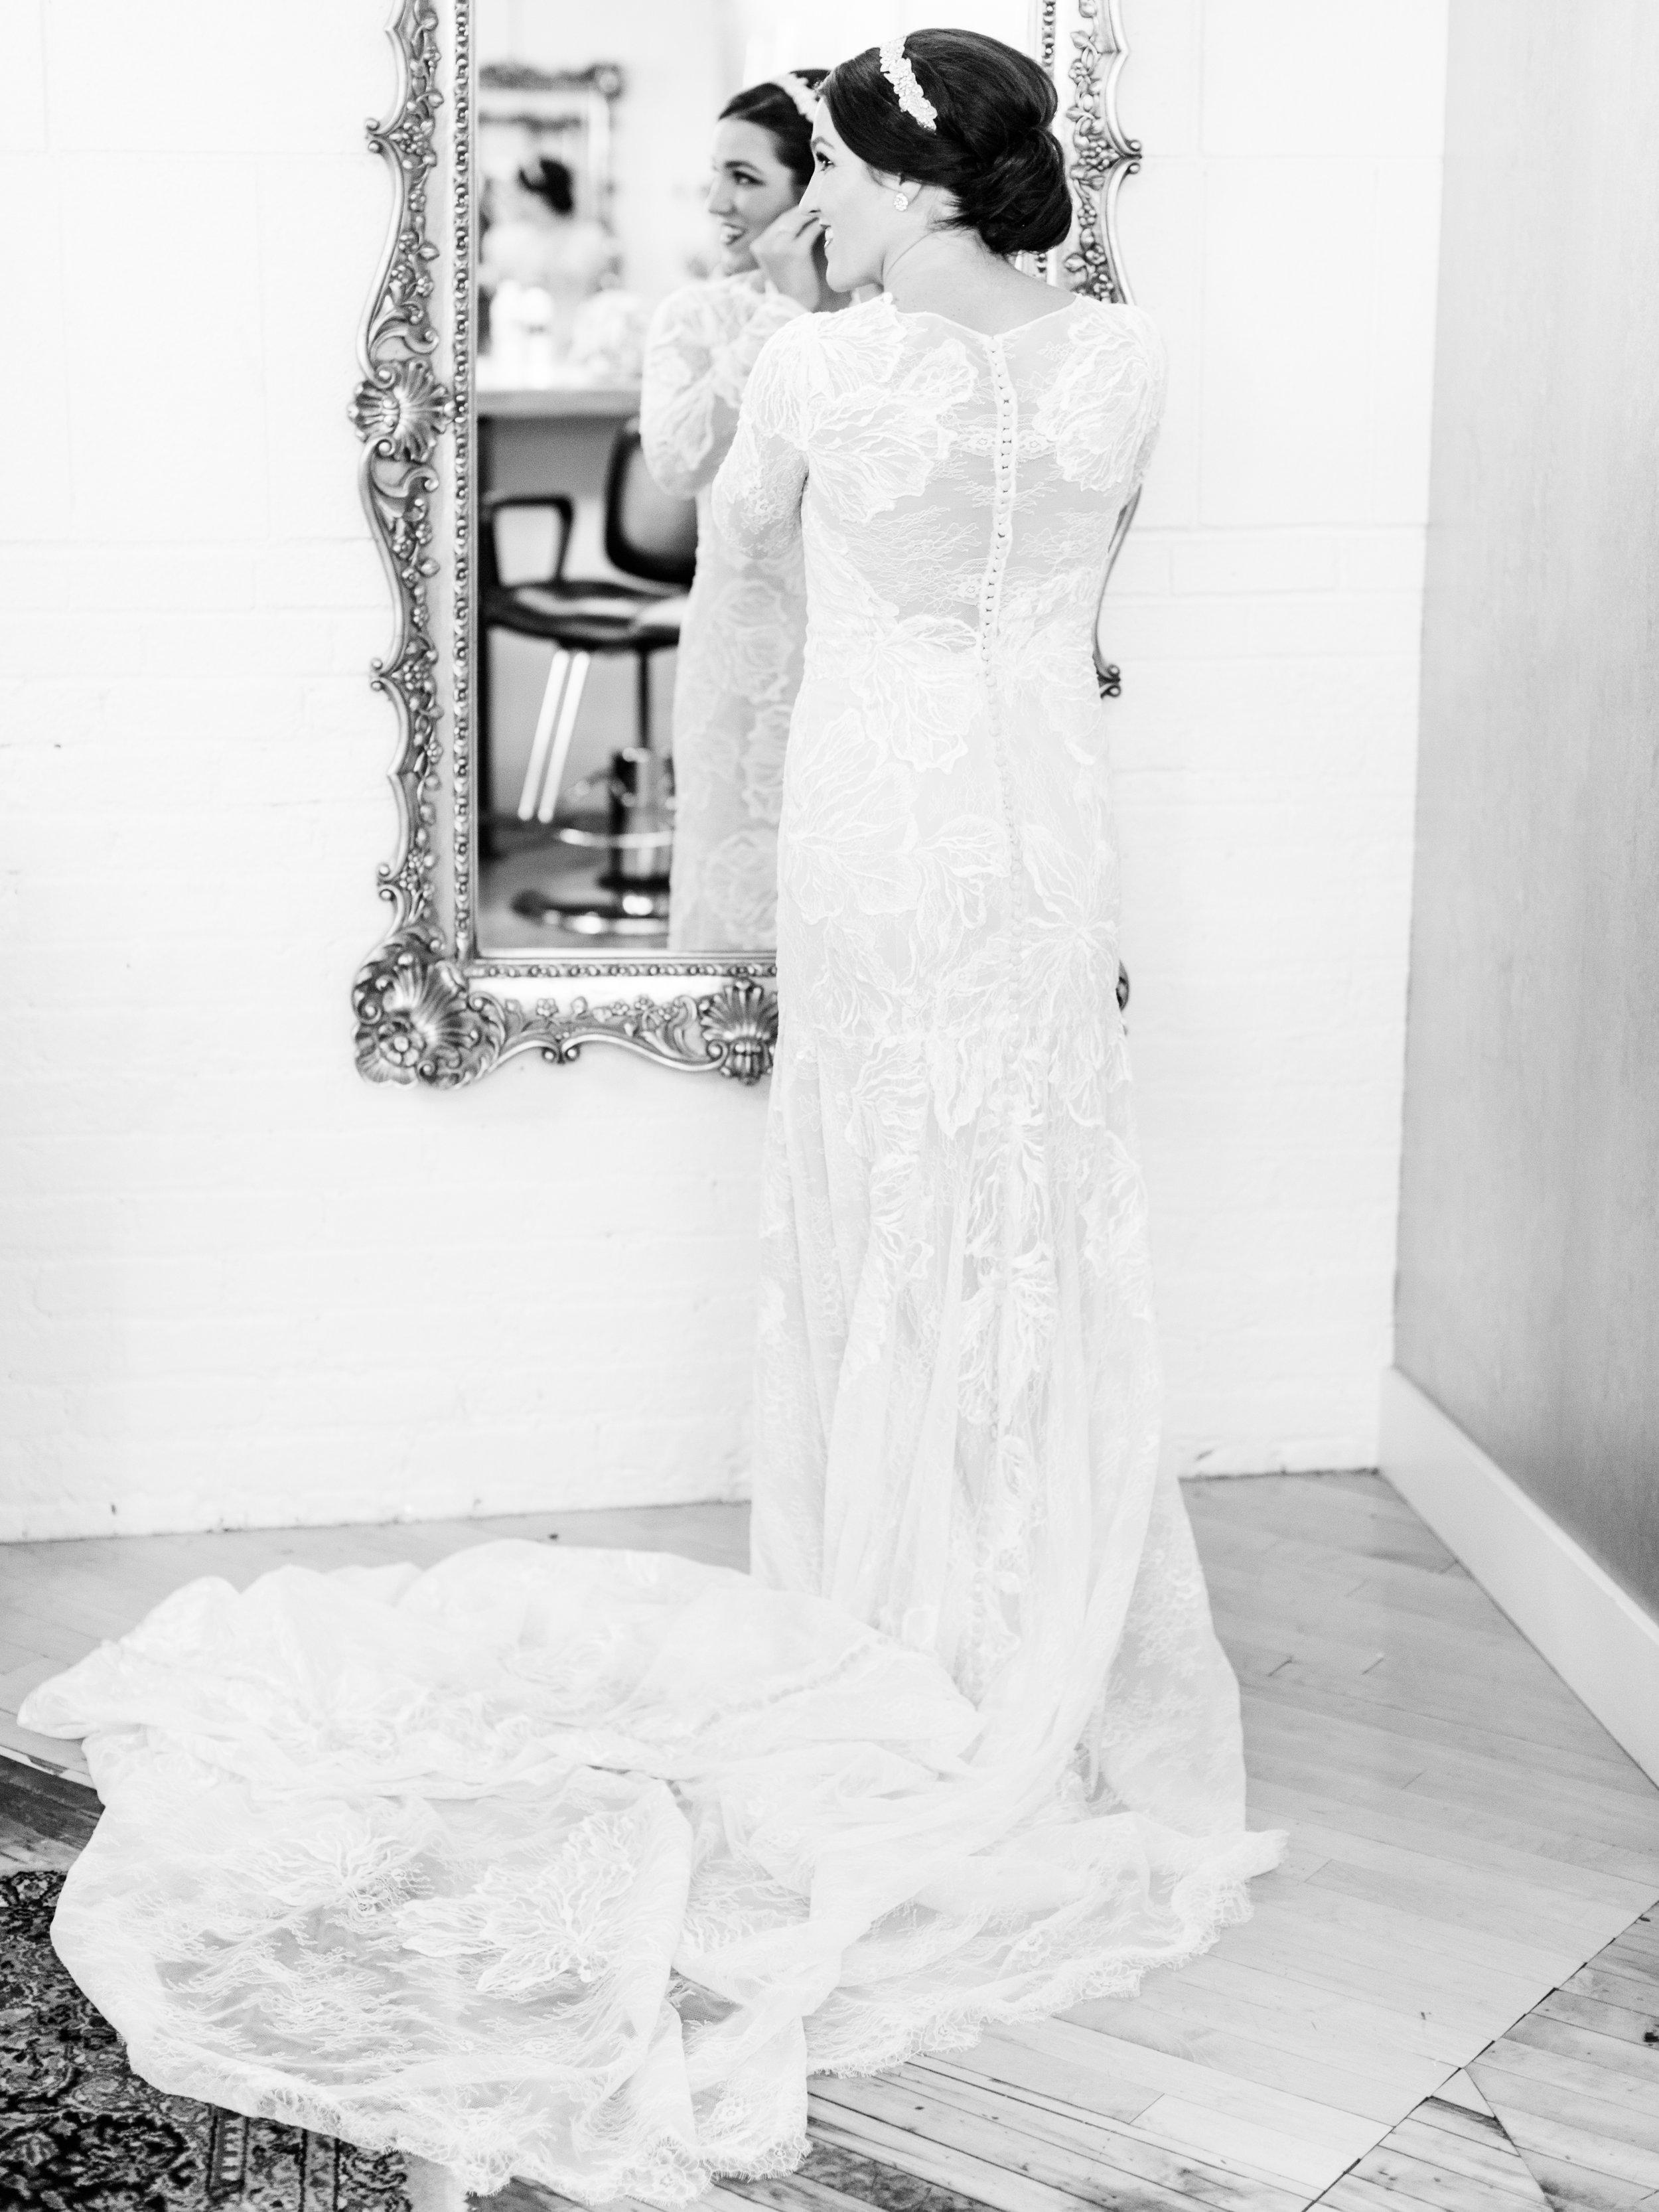 Vogelzang+Wedding+Getting+Ready-111.jpg